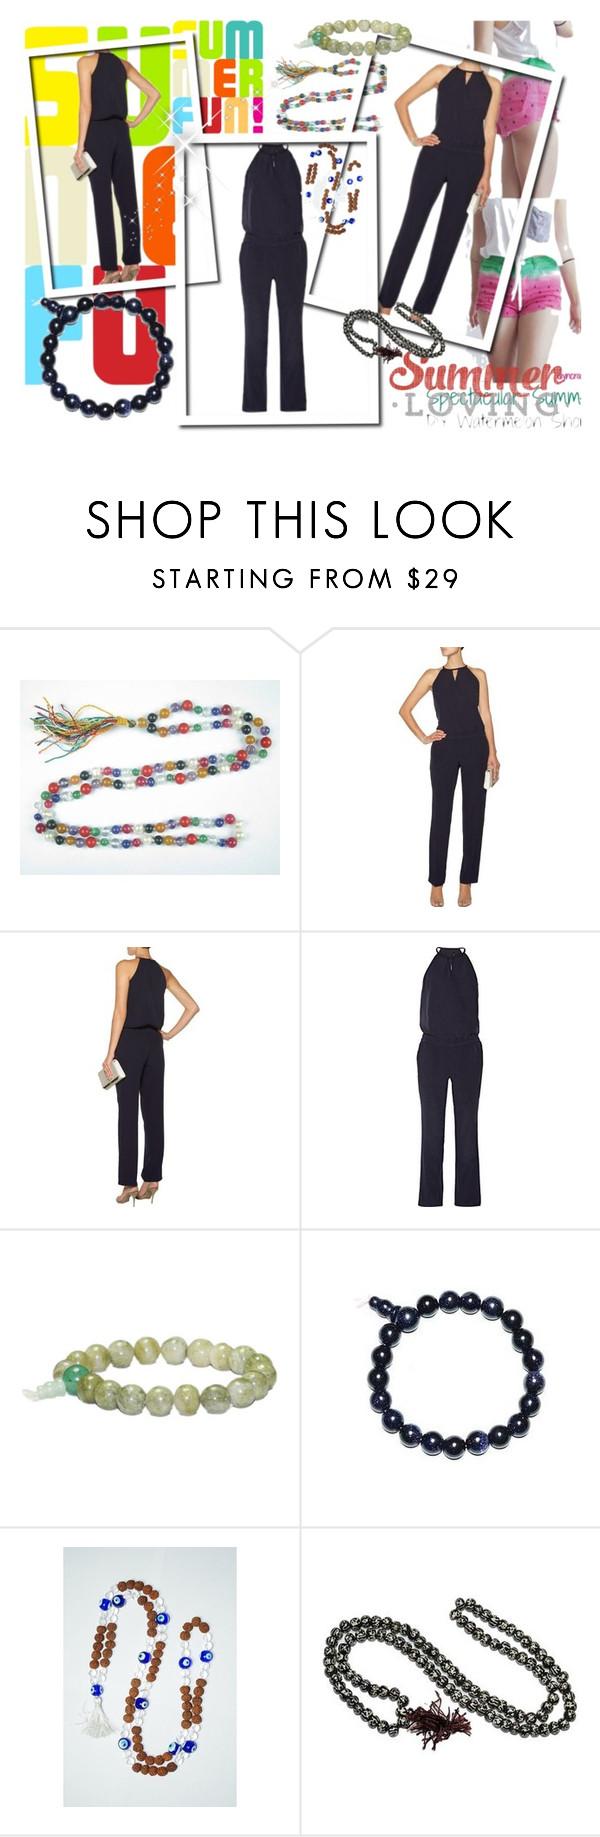 Blue Blake Cady Jumpsuits Loose Pant Romper by era-chandok on Polyvore featuring summerstyle, summerdress, jumpsuit, women and romper   https://www.amazon.ca/s/ref=sr_pg_1?me=A1FLPADQPBV8TK&rh=k%3Ajumpsuit&keywords=jumpsuit&ie=UTF8&qid=1464677179